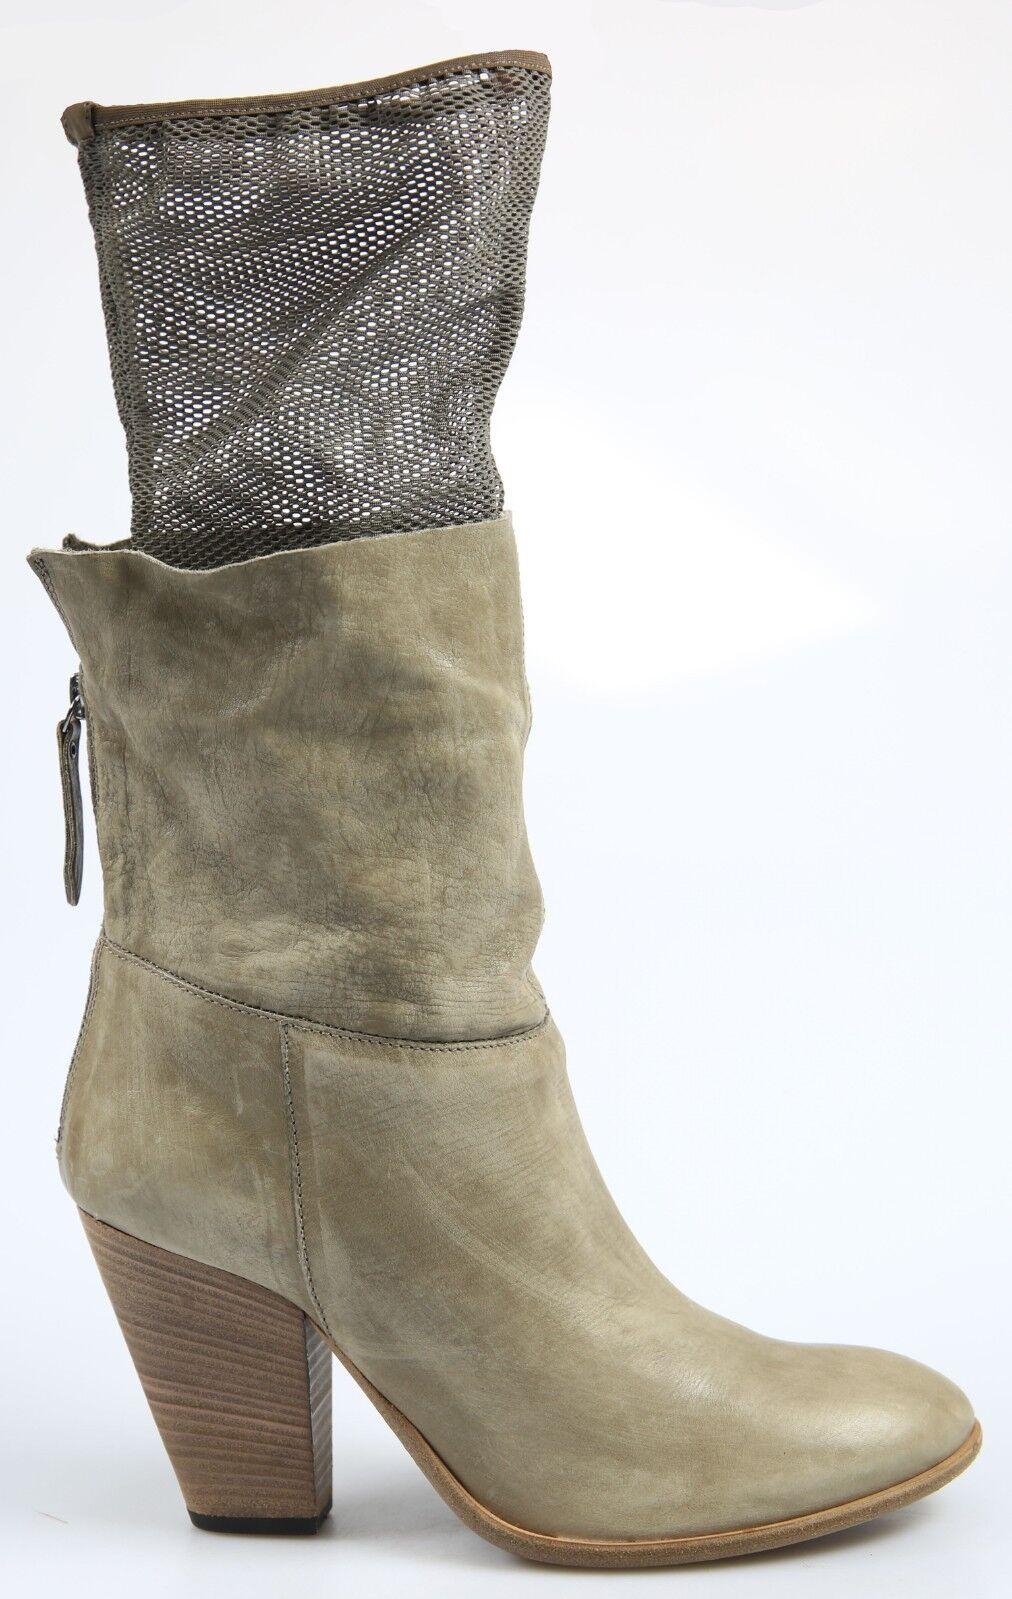 Vic genuina lederbotasletten invierno bota botas tamaño. 39 1 2